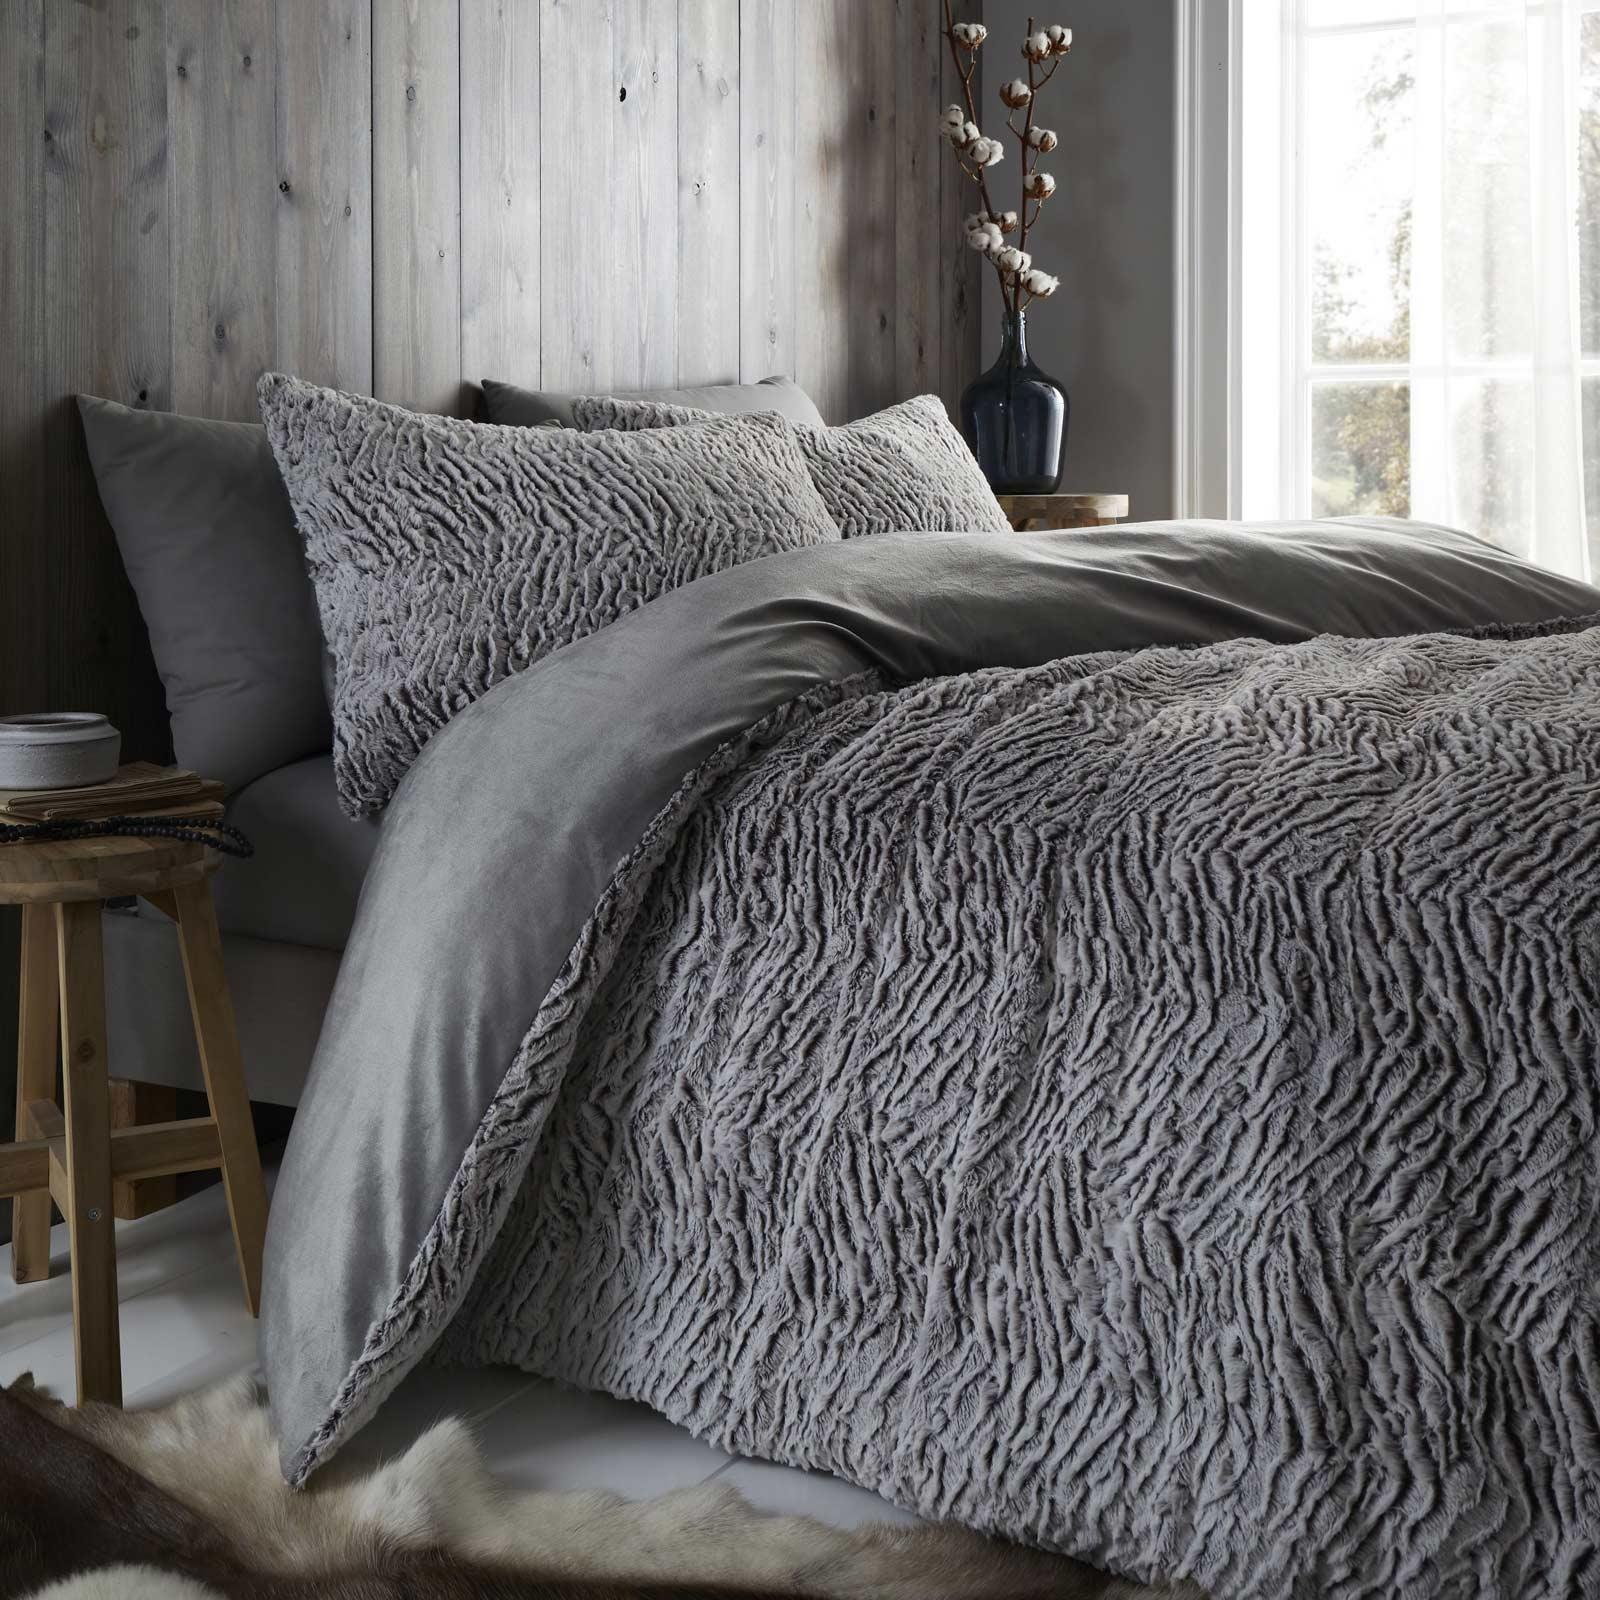 Catherine Lansfield Wolf Neutral Duvet Covers Faux Fur Fleece Quilt Bedding Sets Ebay